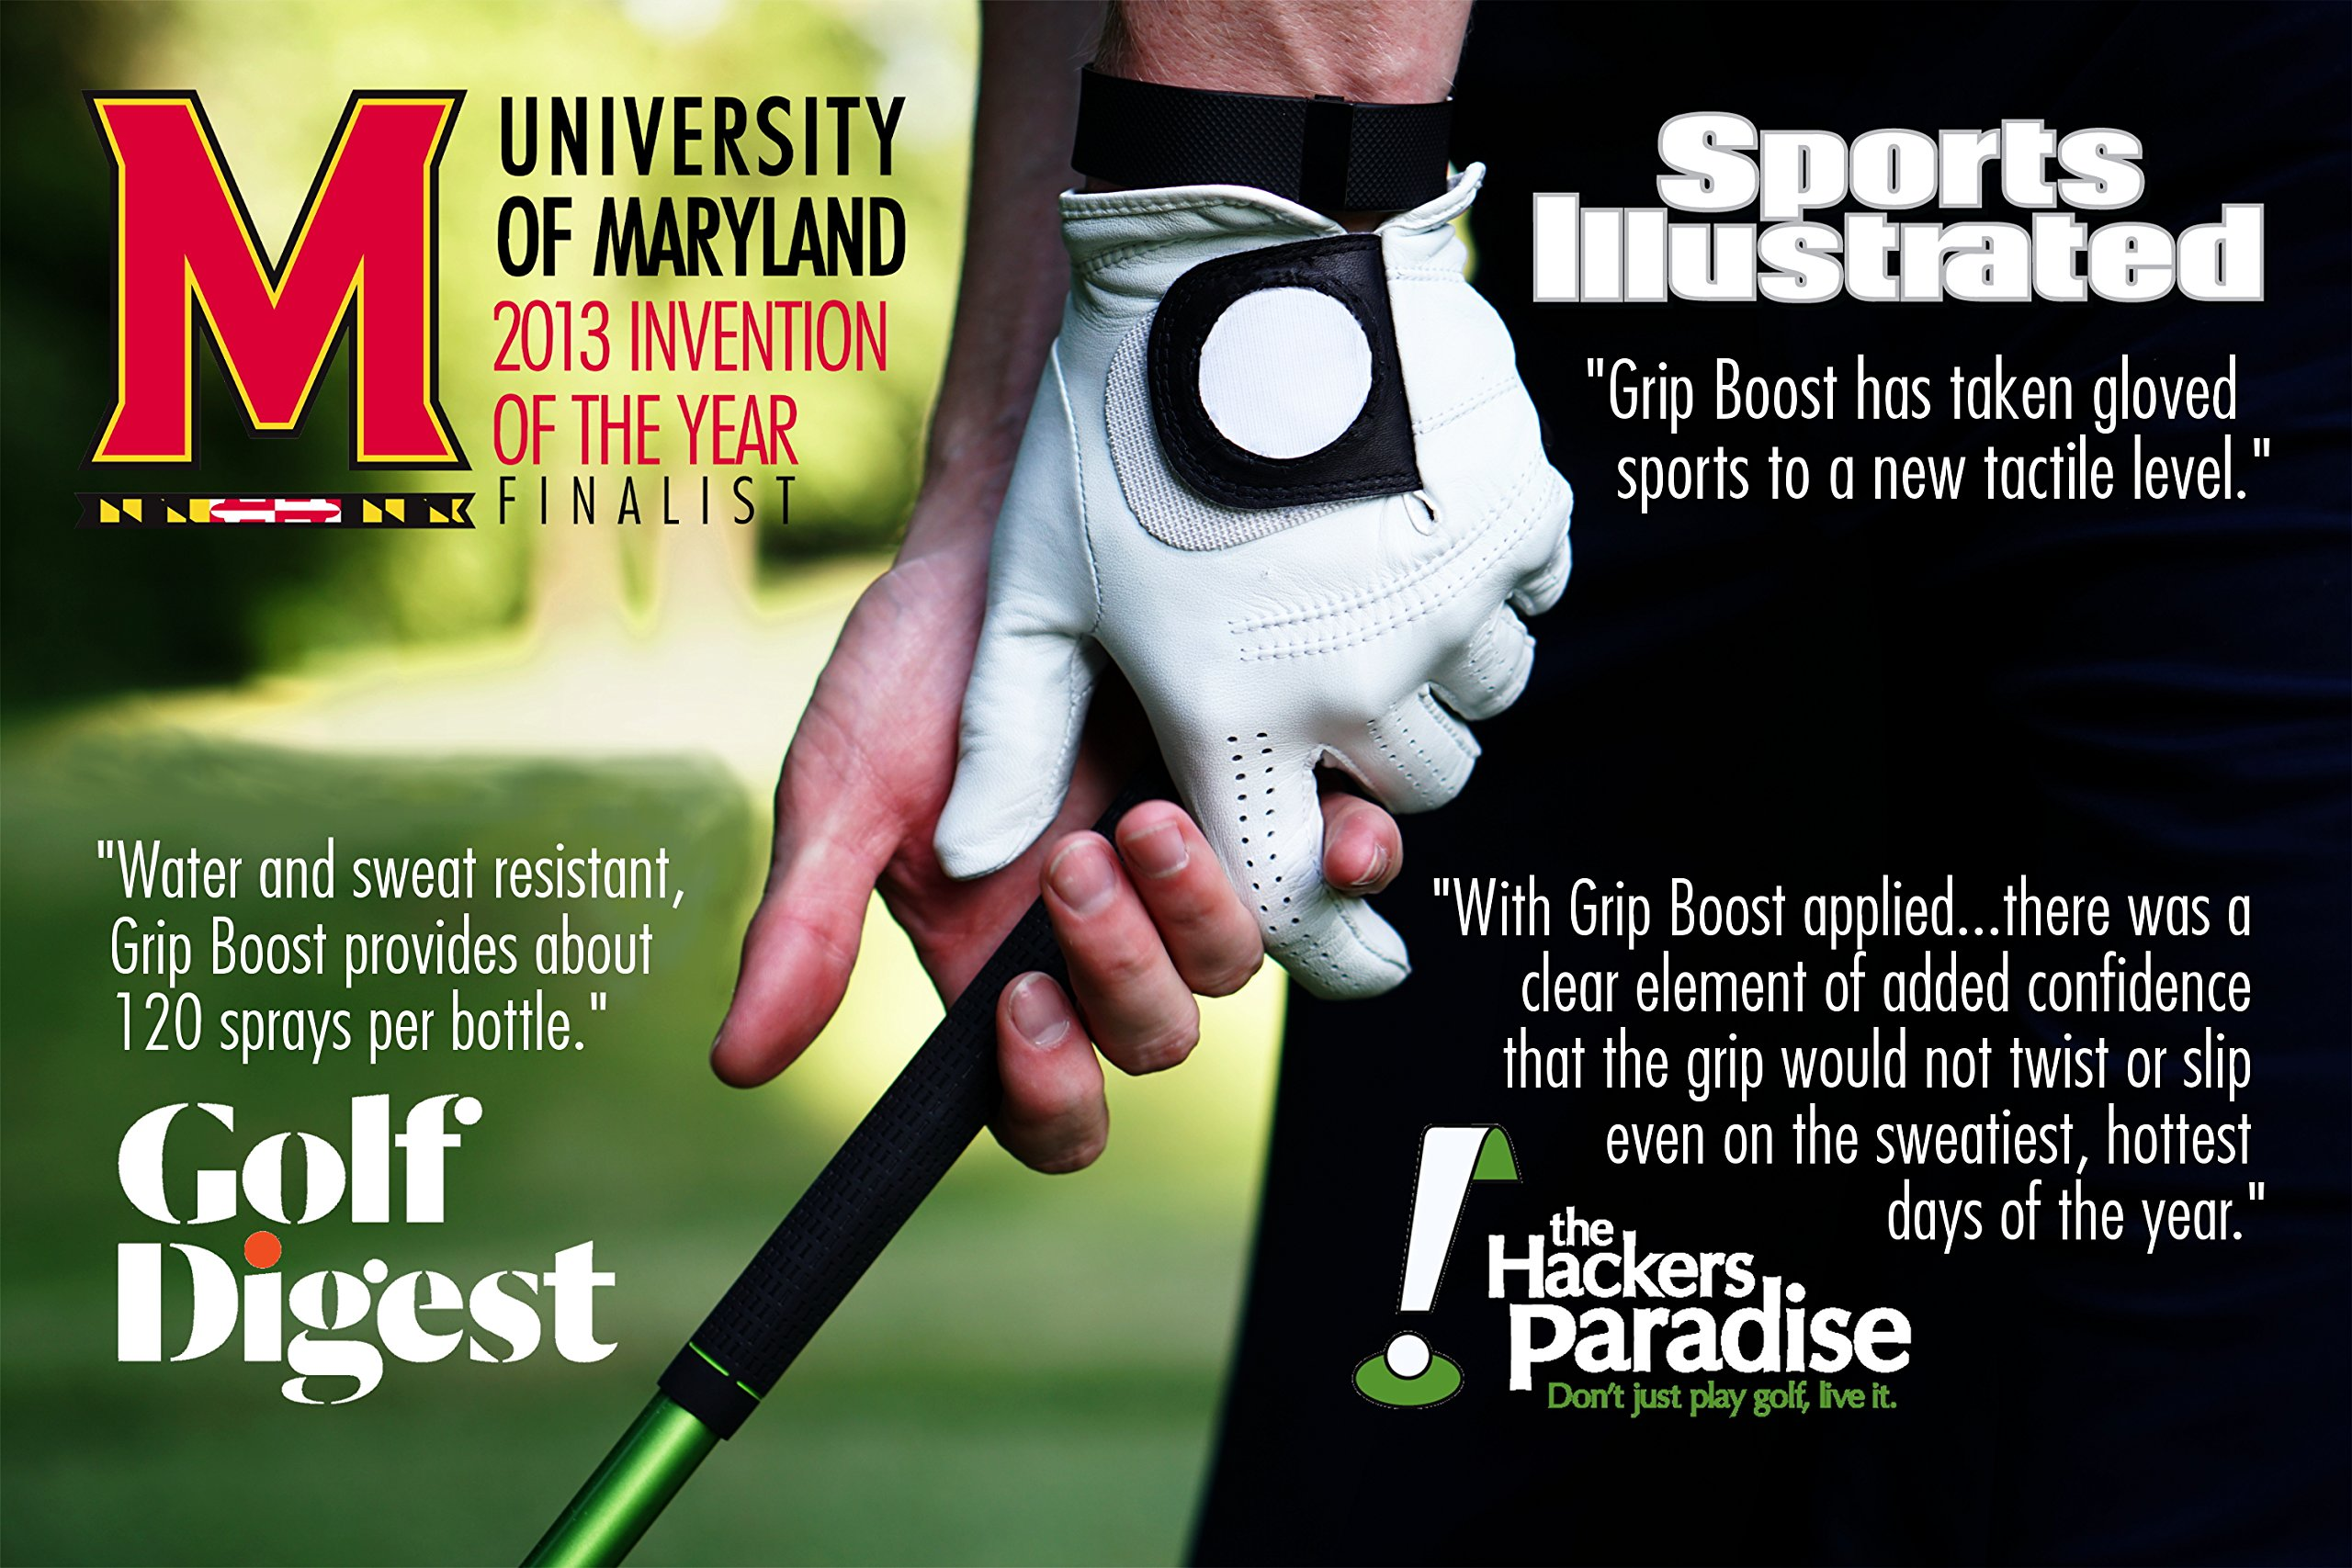 Grip Boost Sweat Proof Grip Enhancing GB Golf Spray 2oz. by Grip Boost (Image #4)